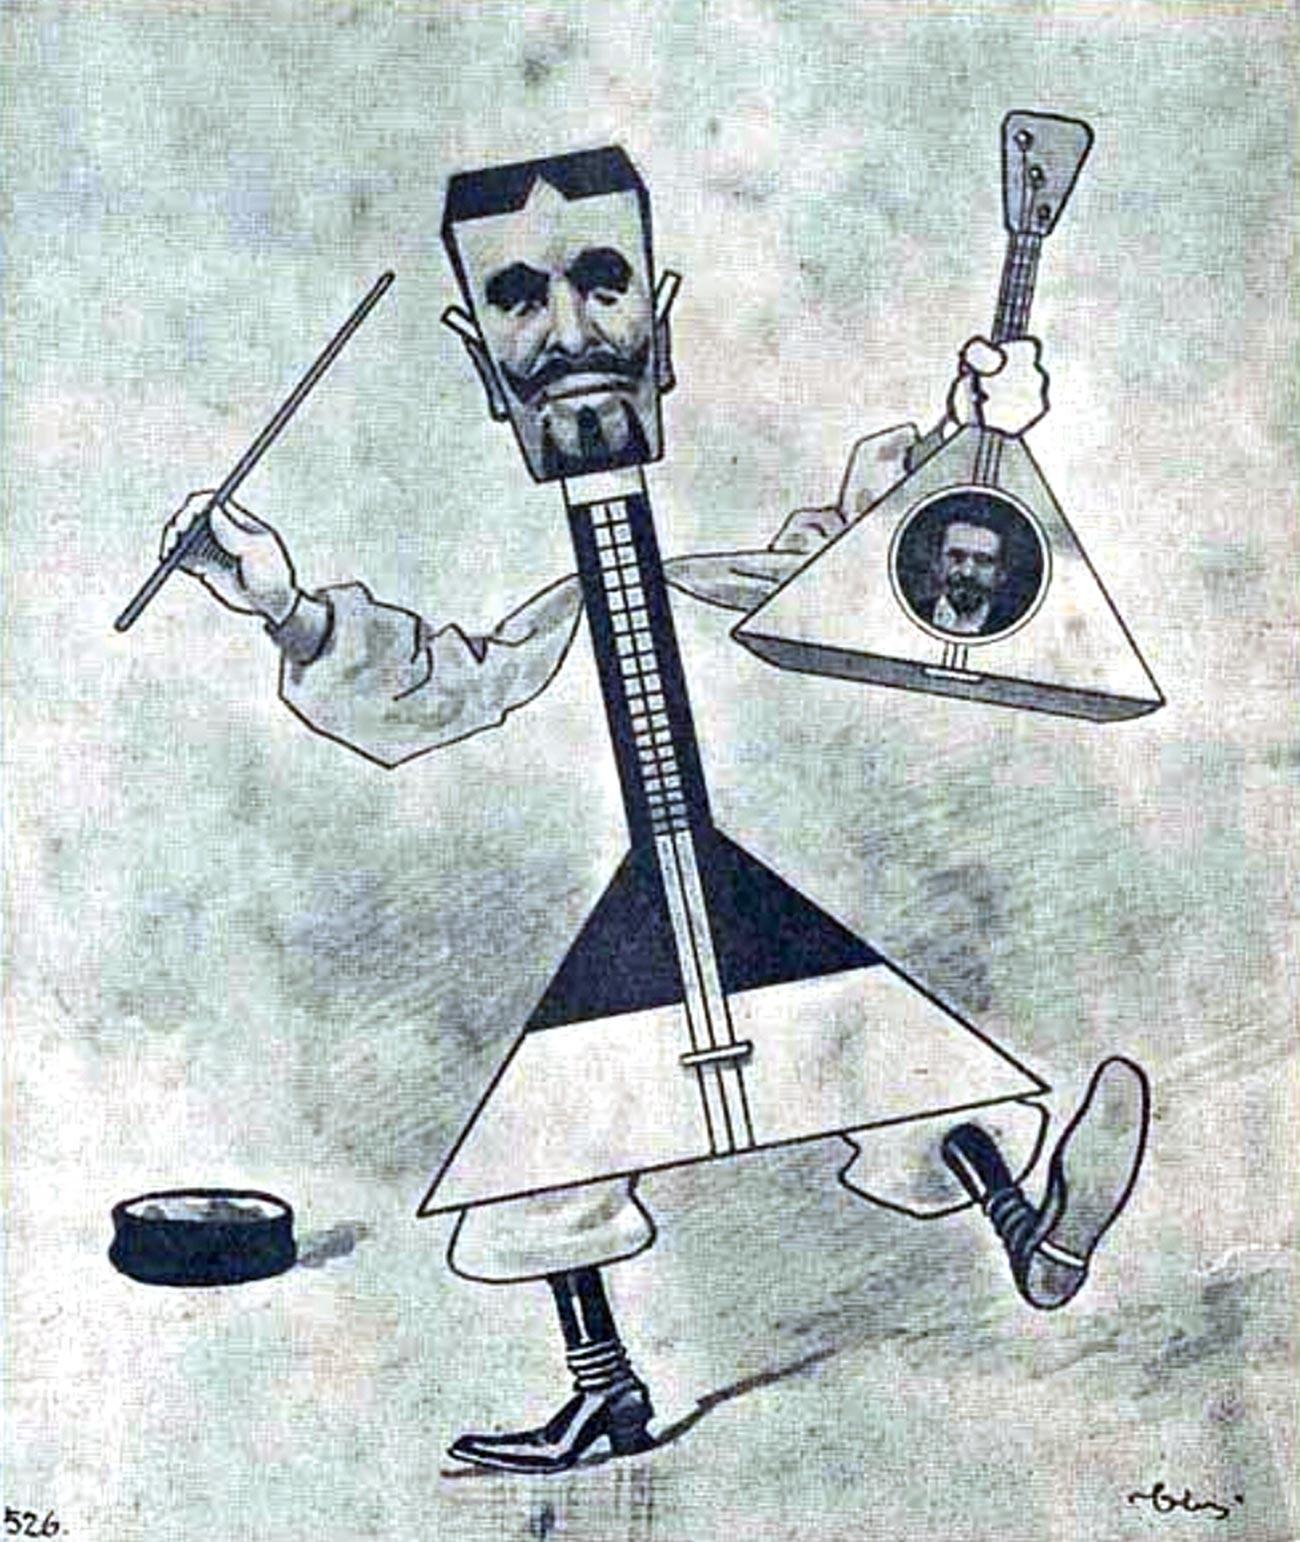 Kartun Vasily Andreyev dalam majalah Strekoza, 1903.